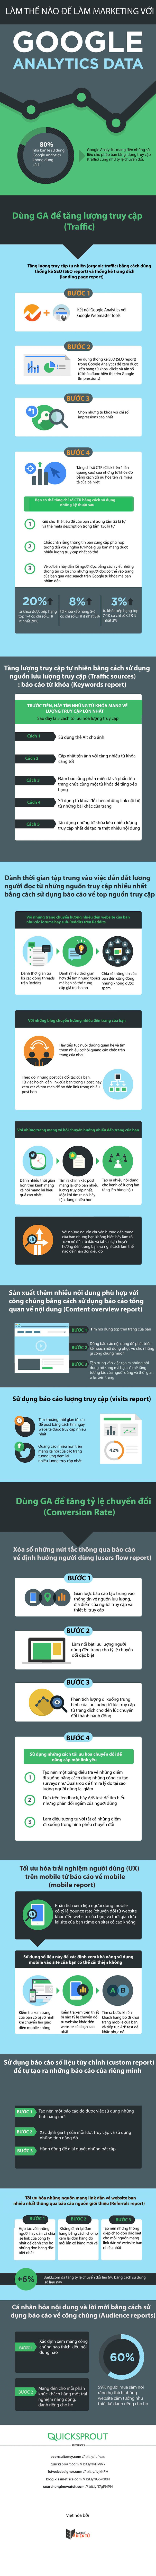 Google_Analytics_Infographic1